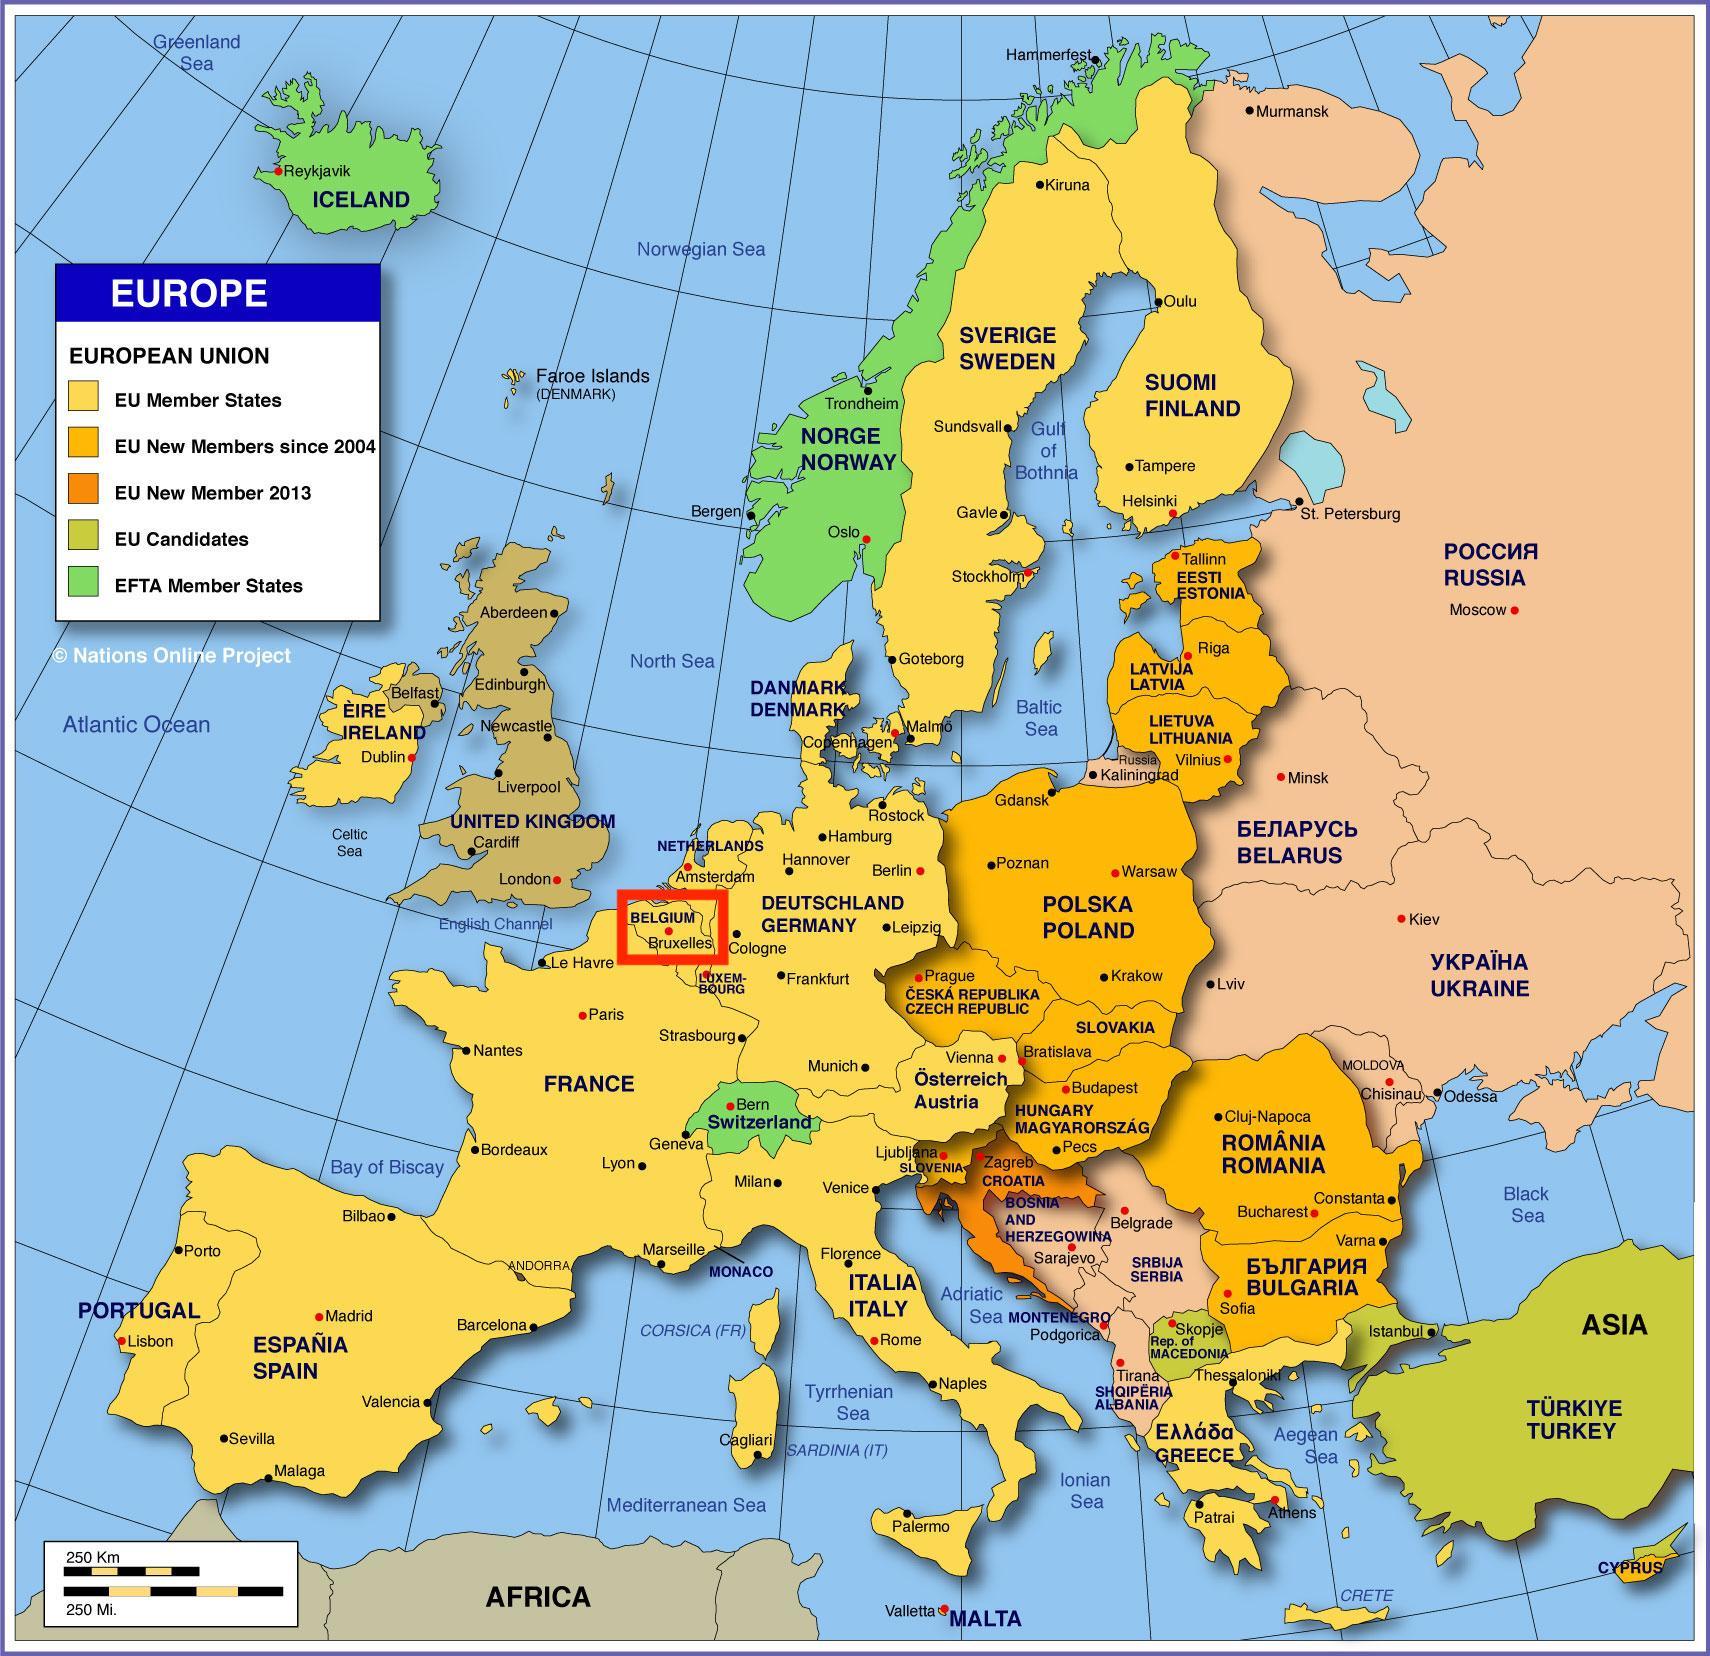 Cartina Europa.Bruxelles Mappa Dell Europa Cartina Dell Europa Mostrando Bruxelles Belgio